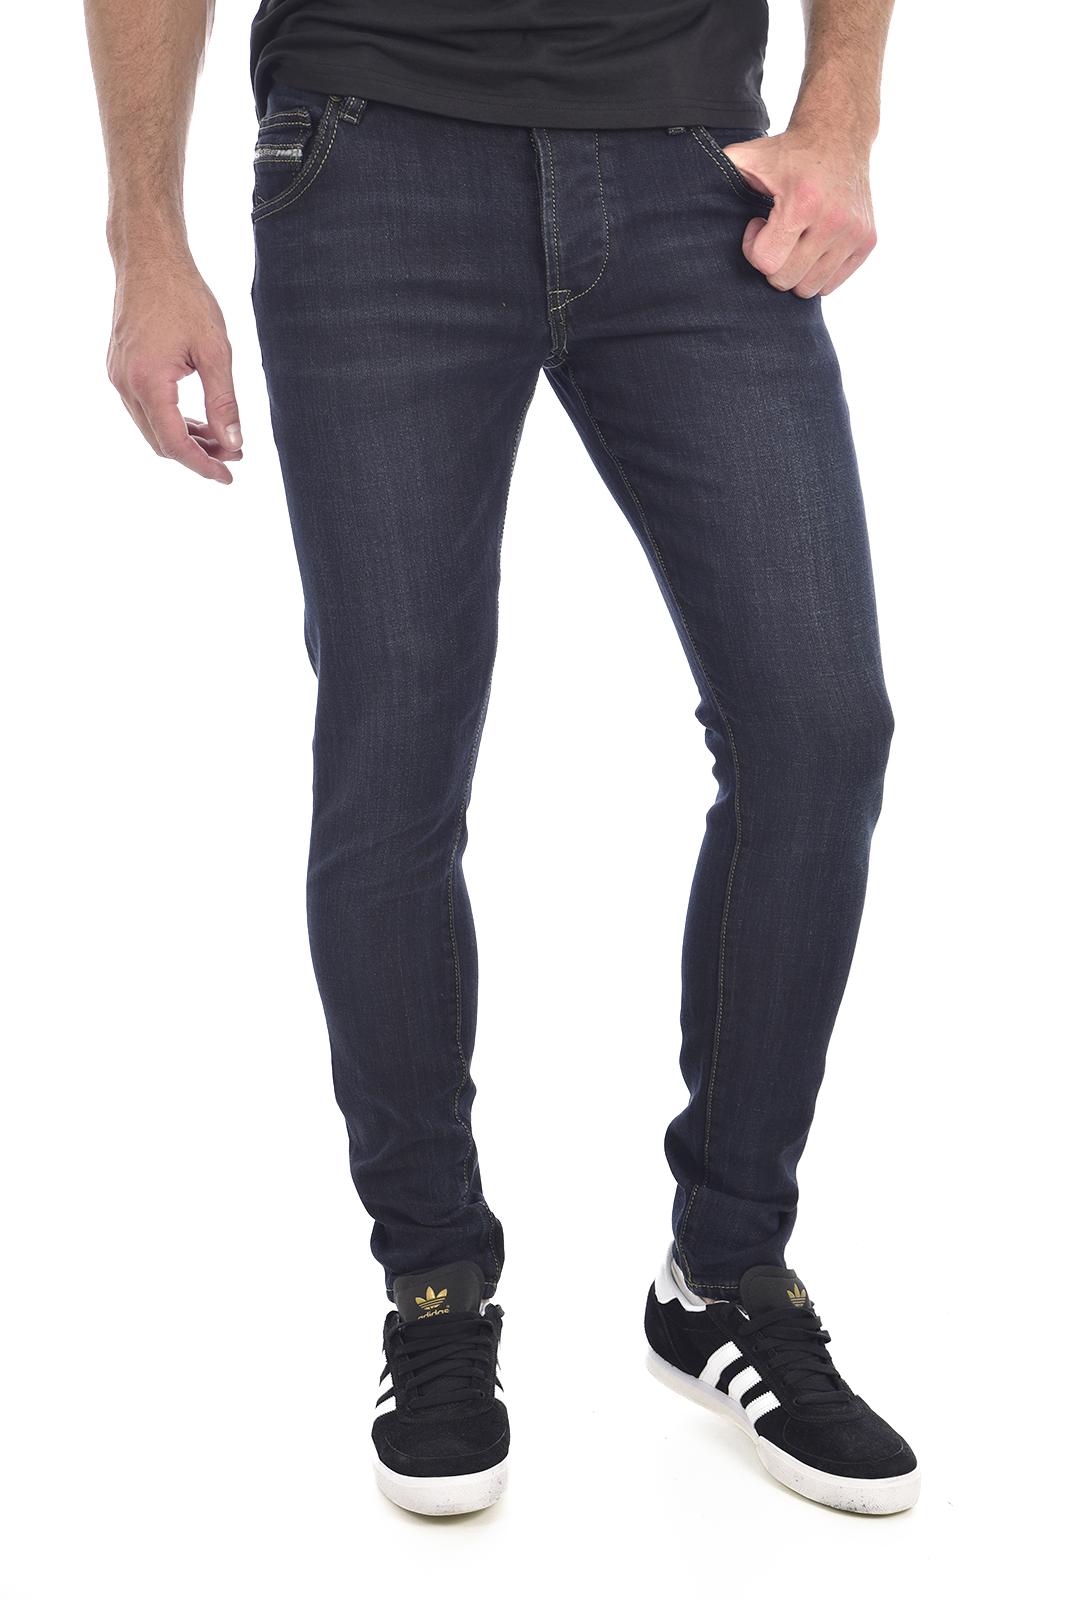 Jeans  Leo gutti L1809 bleu